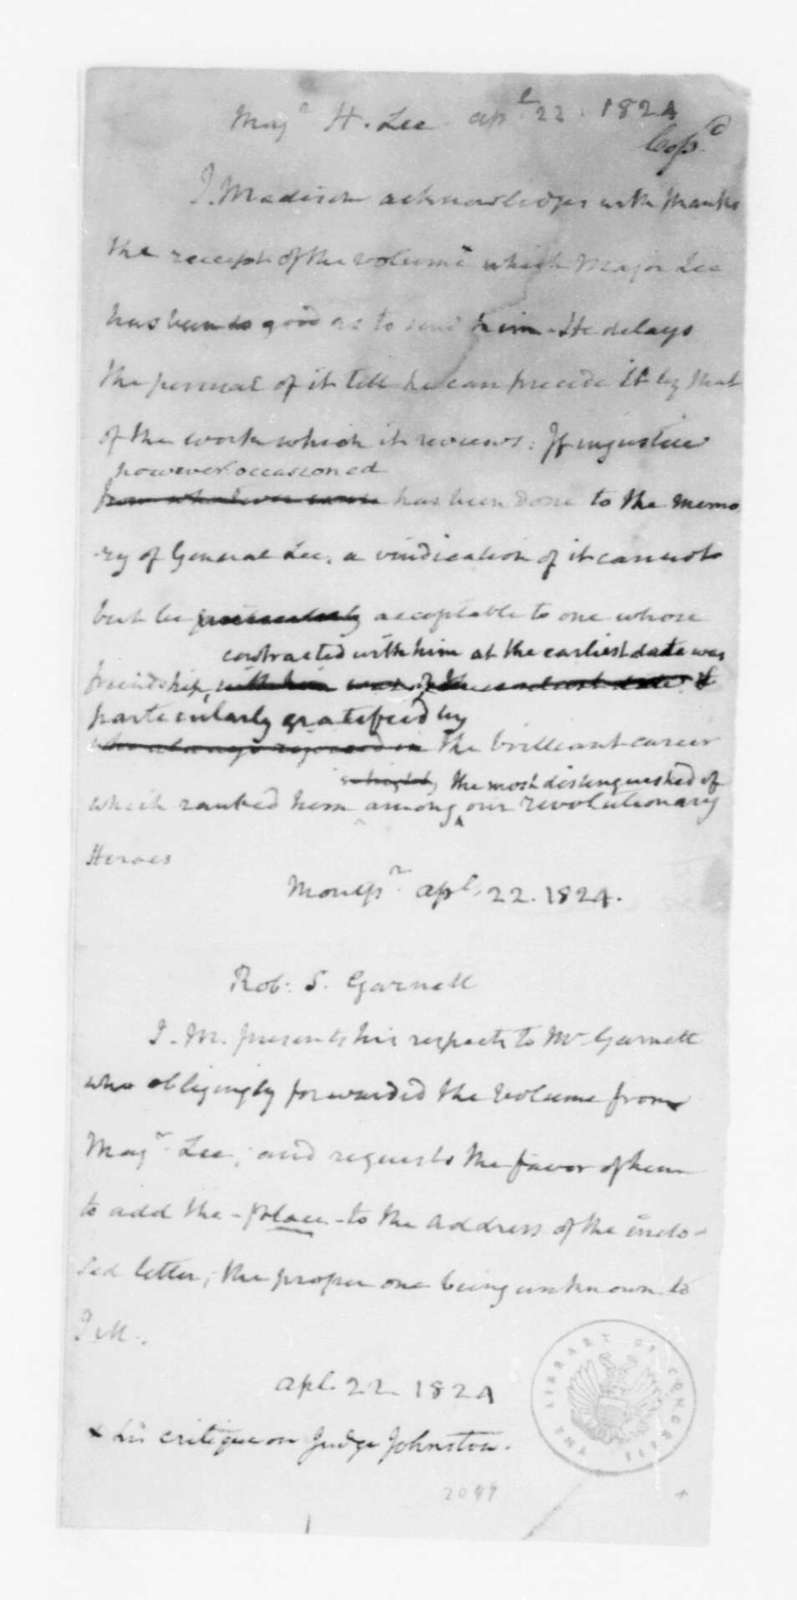 James Madison to Henry Lee and Robert Garnett, April 22, 1824.